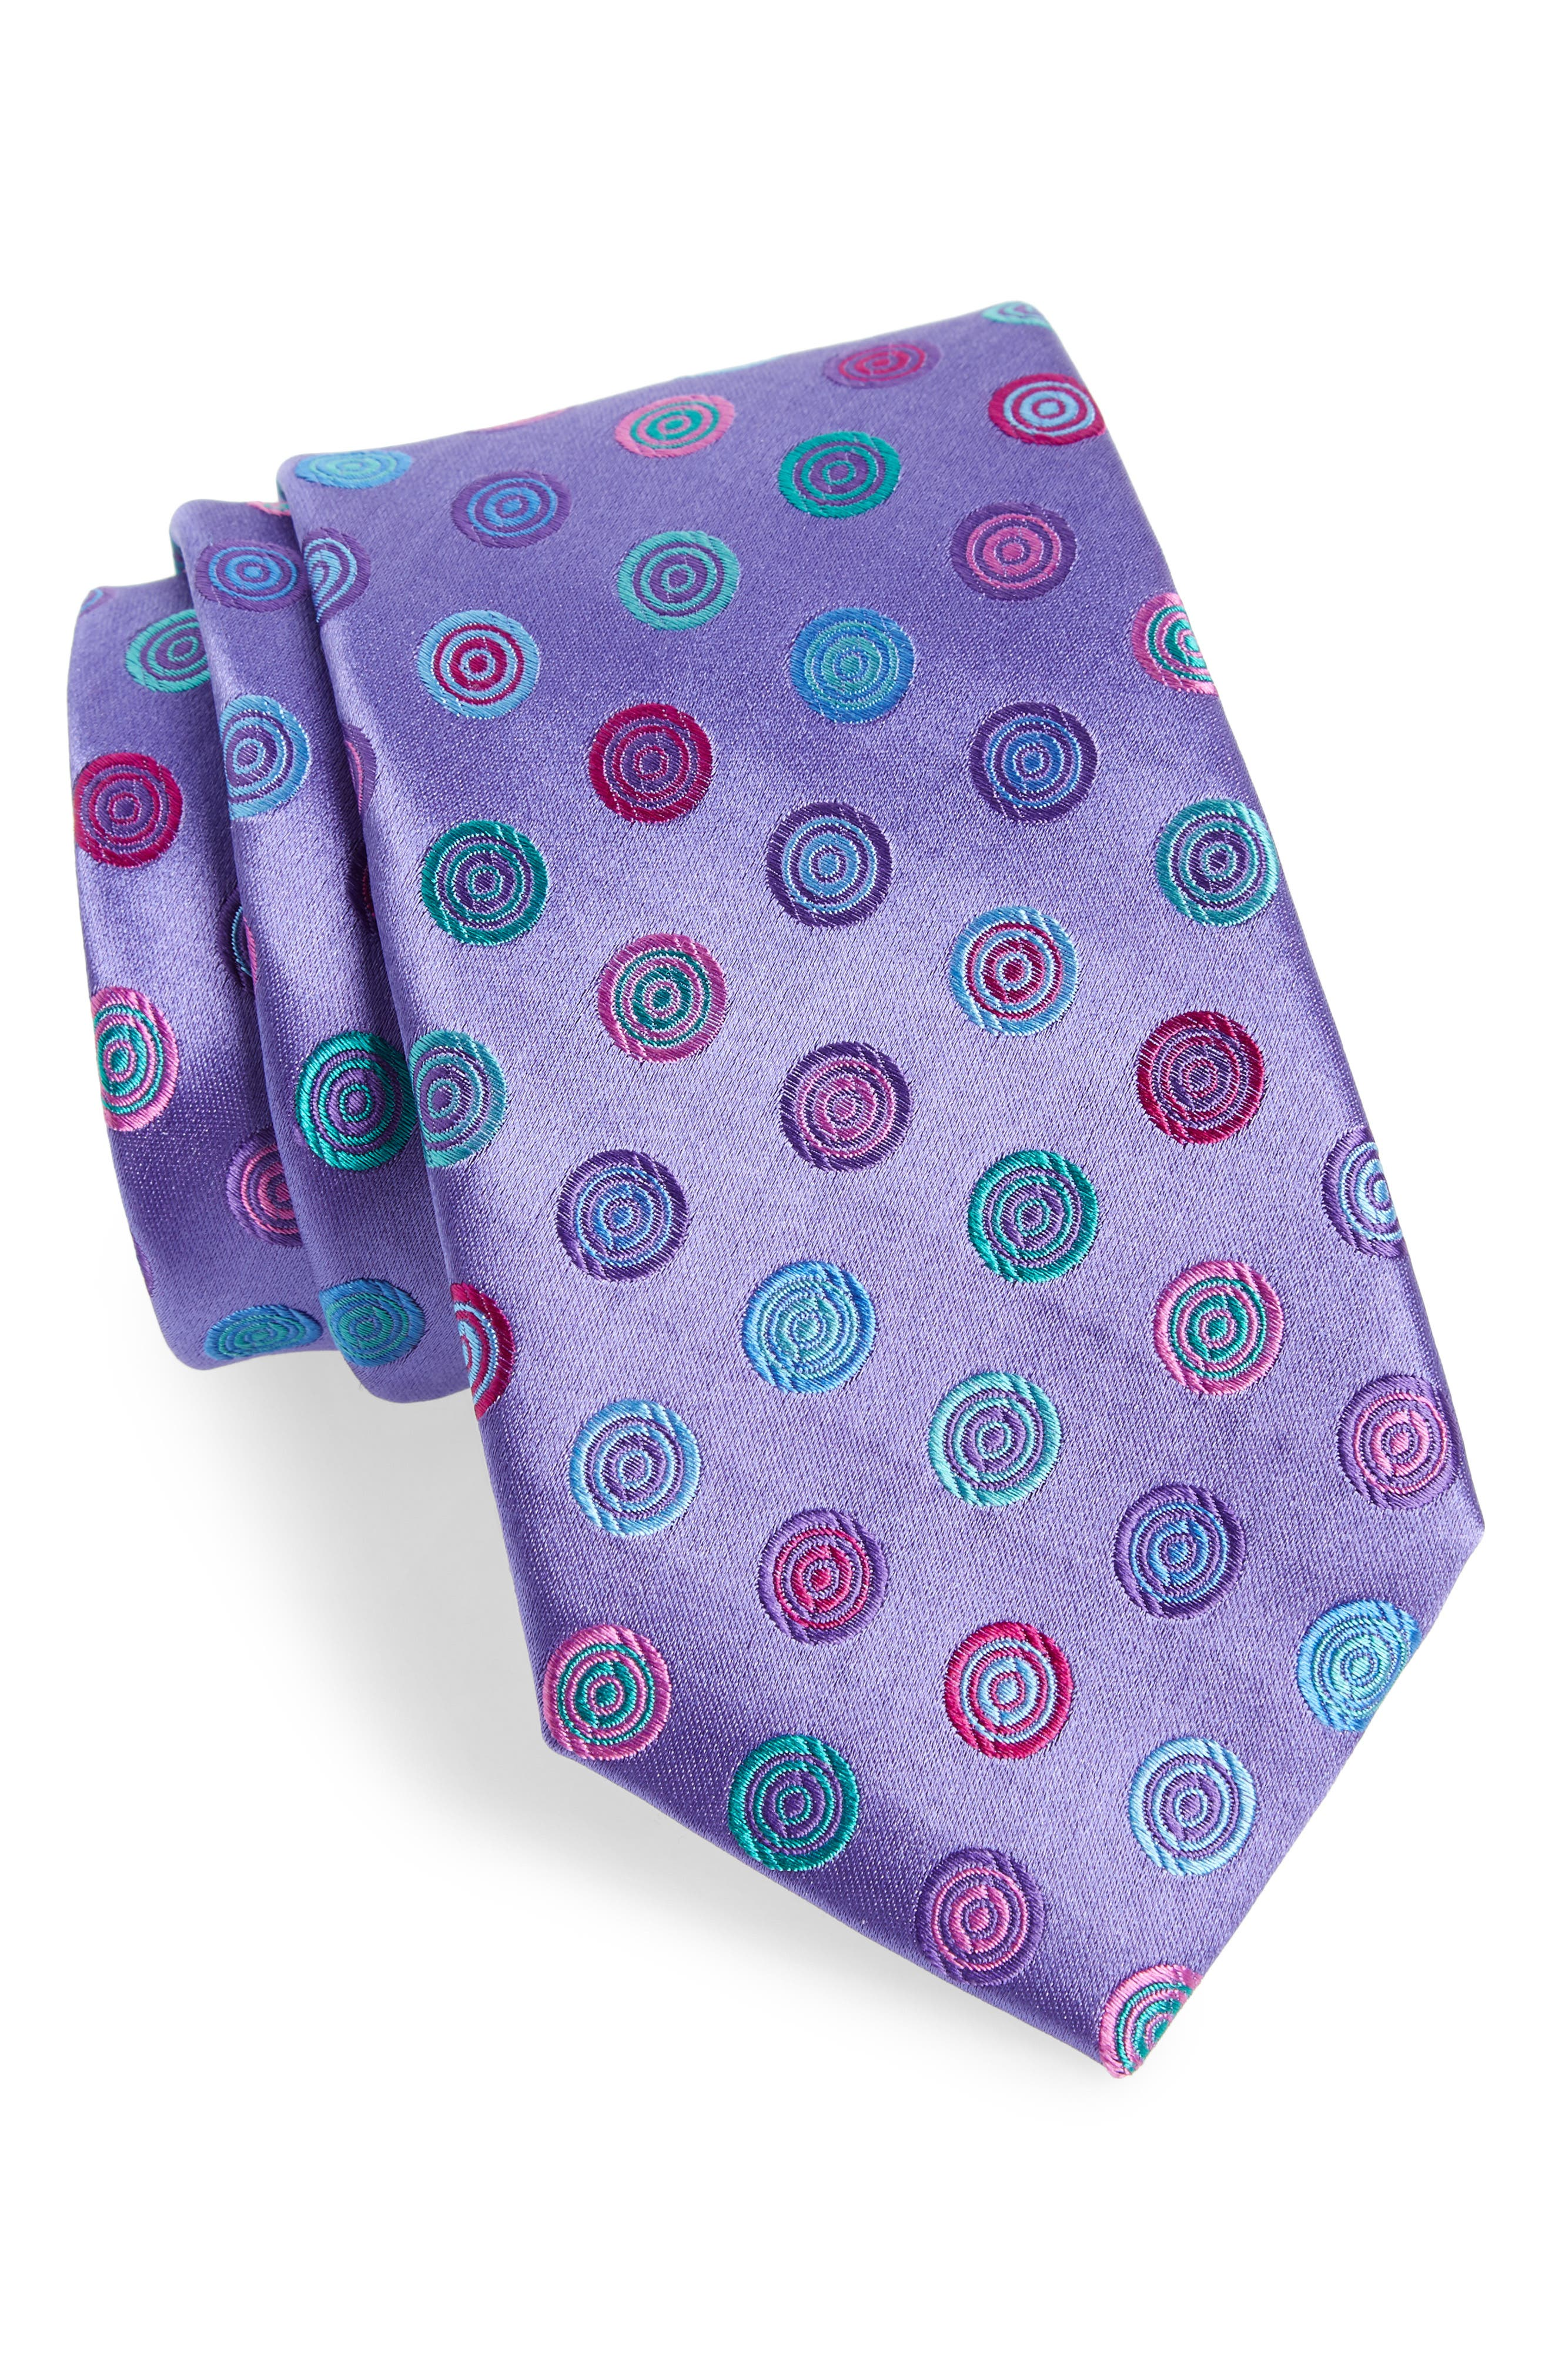 Nordstrom Men's Shop Santa Lucia Medallion Silk Tie